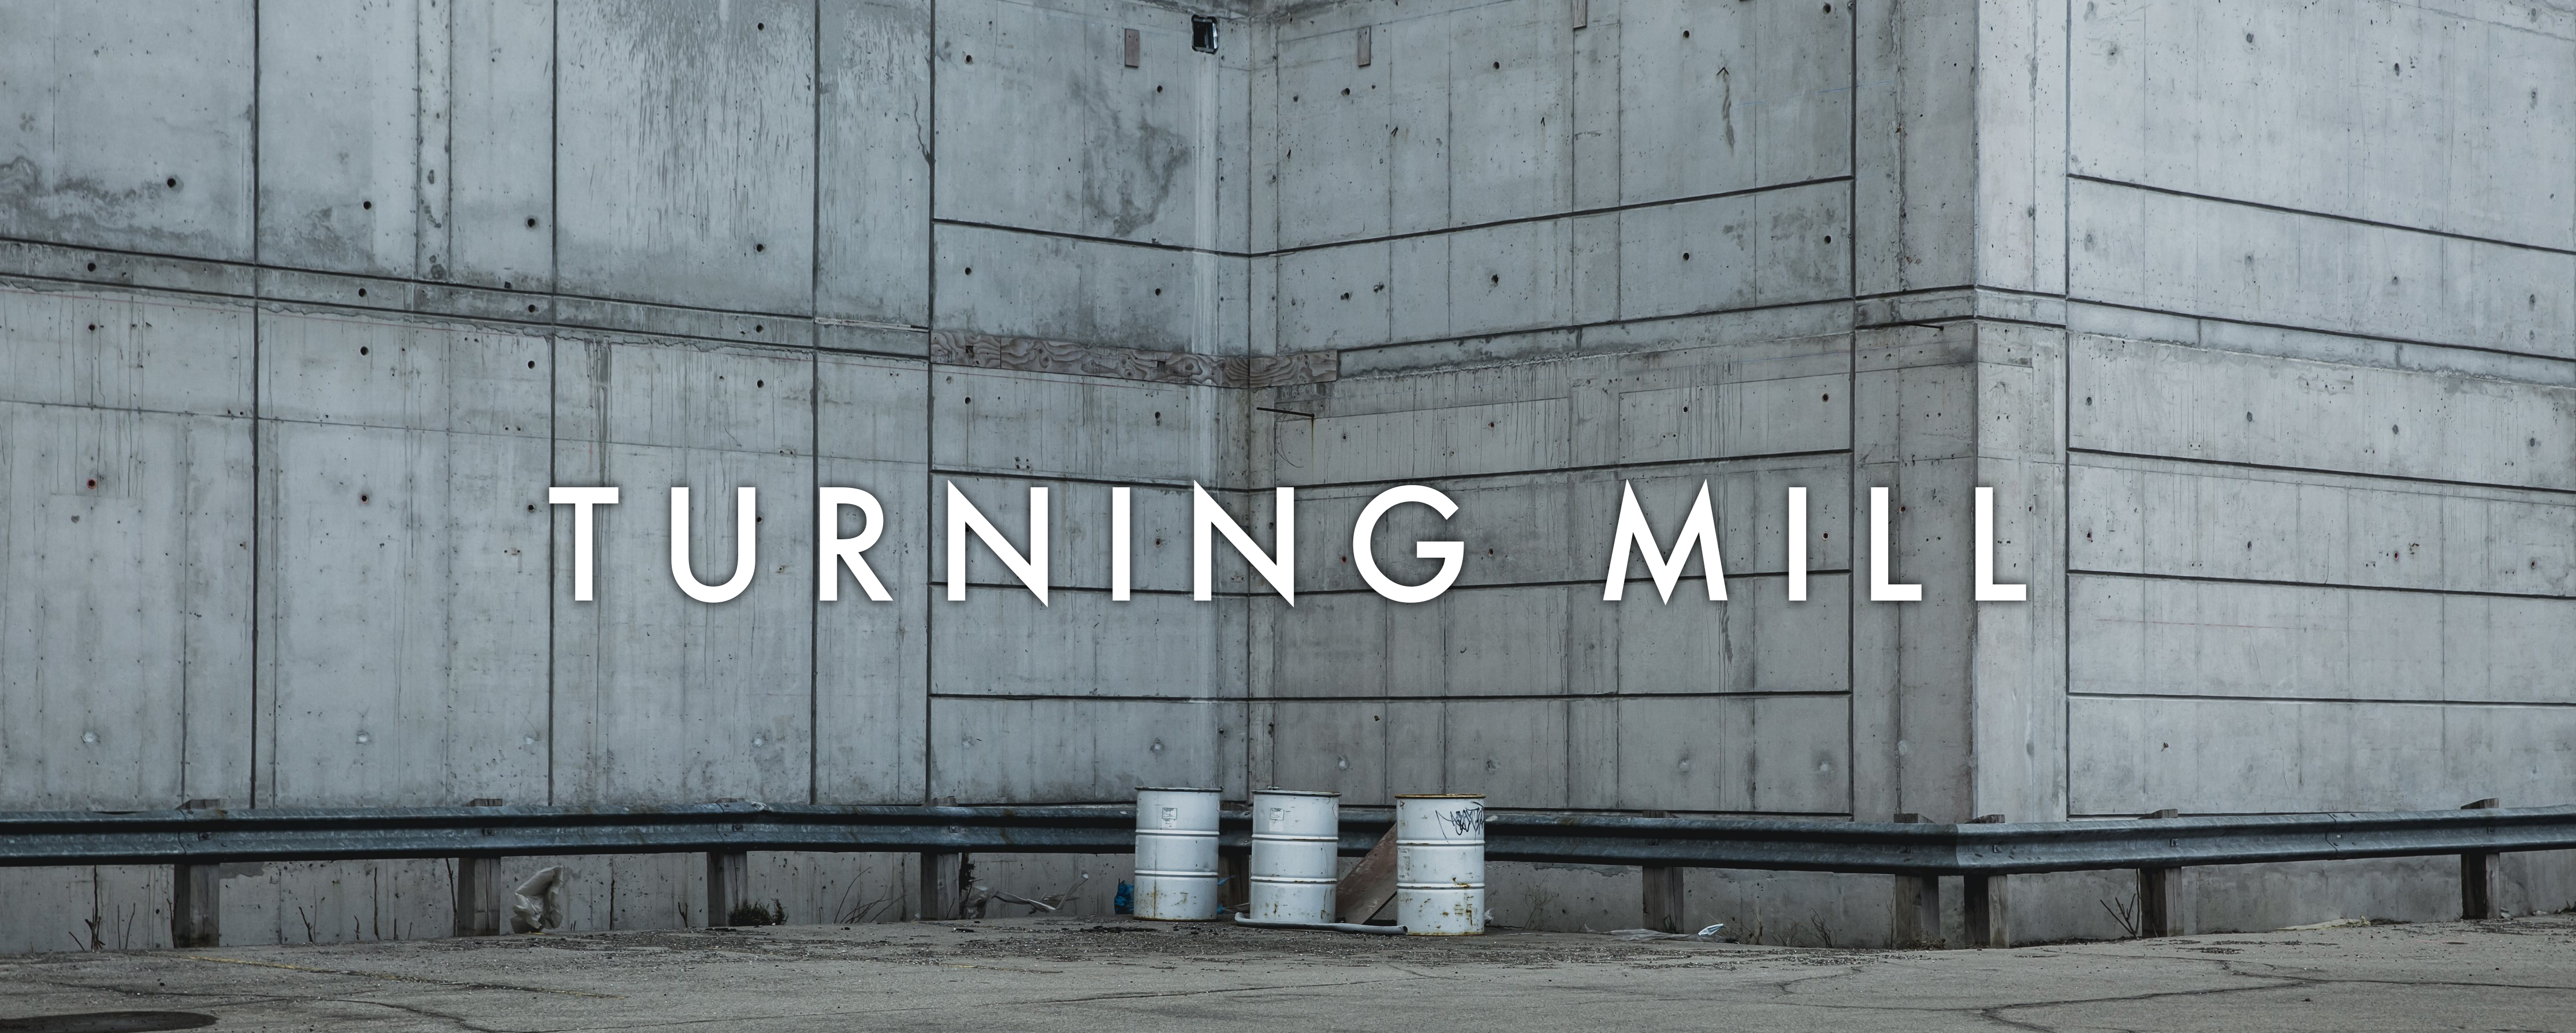 turning mill, lexington, ma